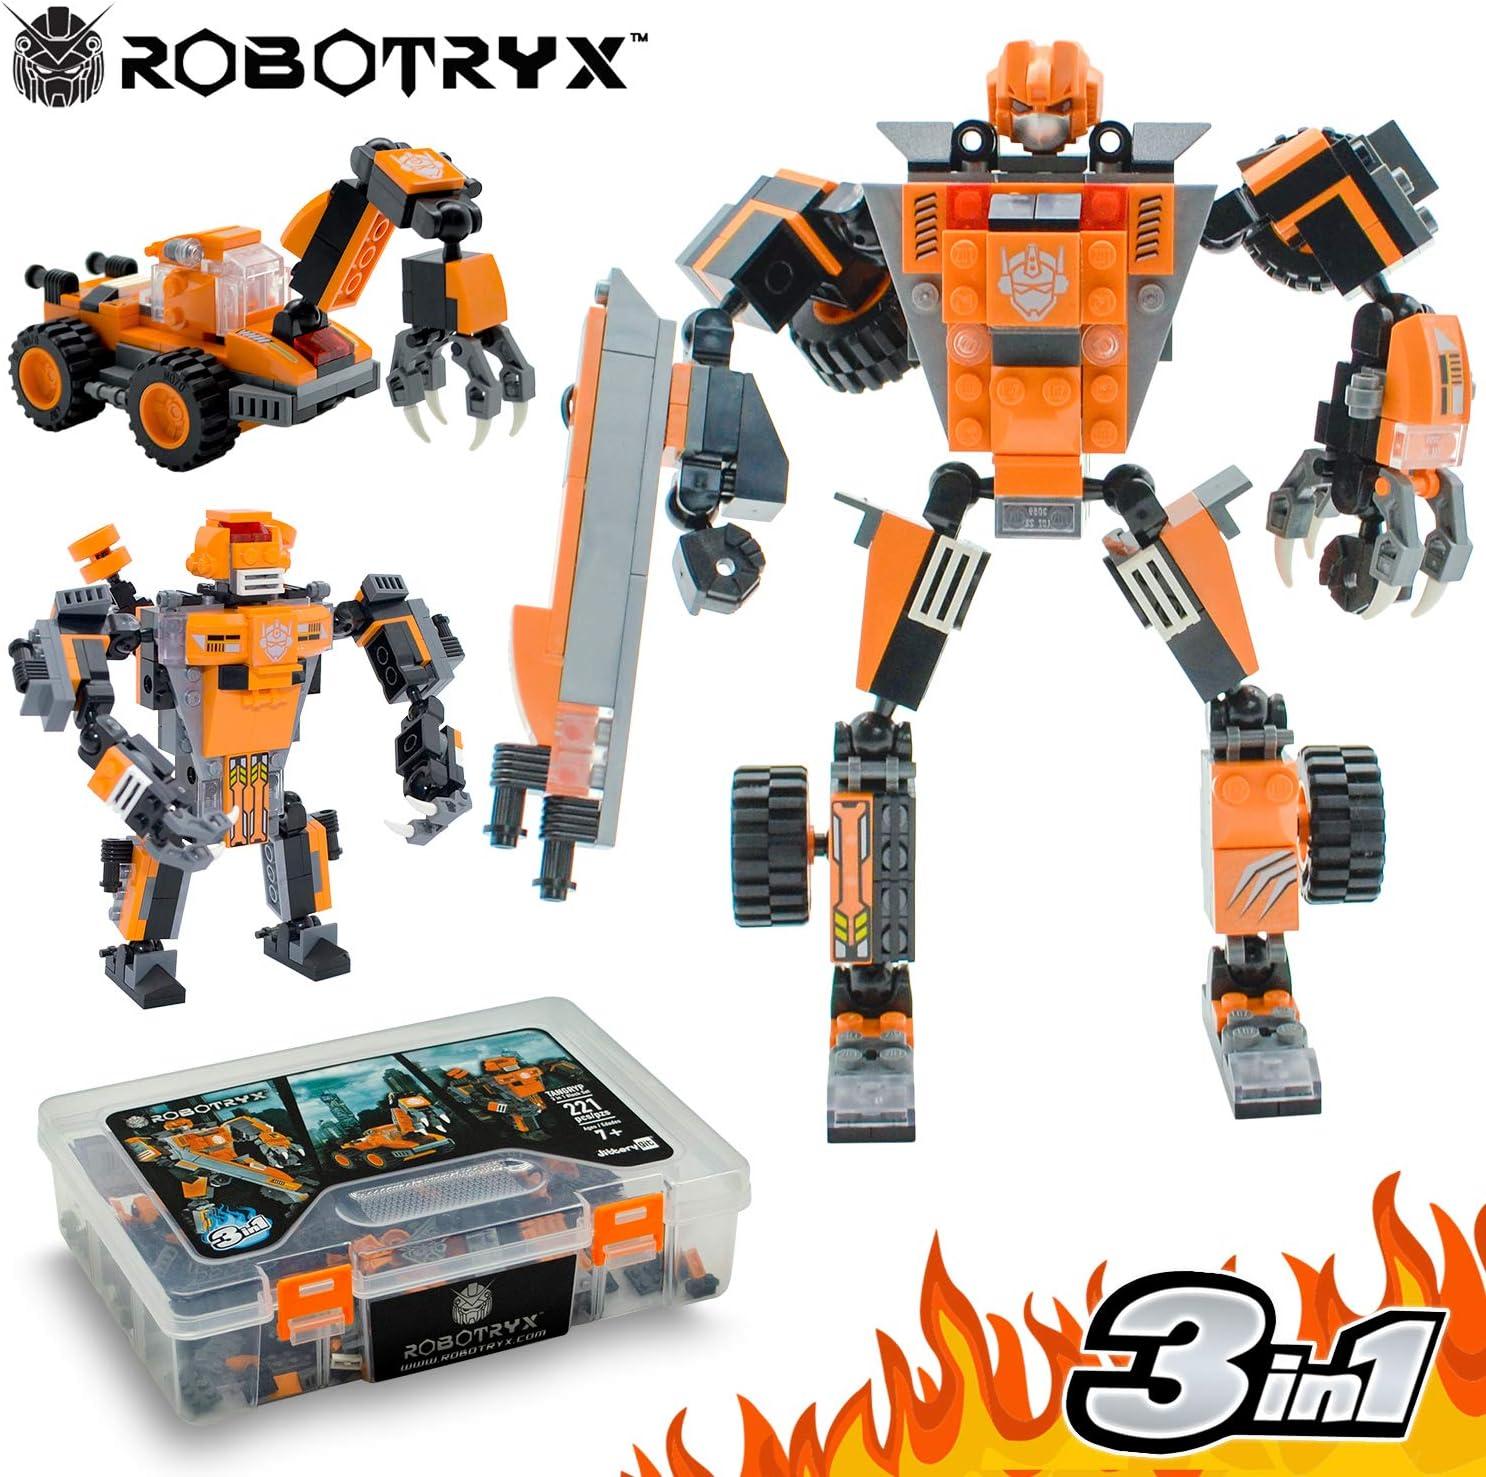 JITTERYGIT Juguete Robot Stem | Divertido Juego Creativo 3 en 1 ...